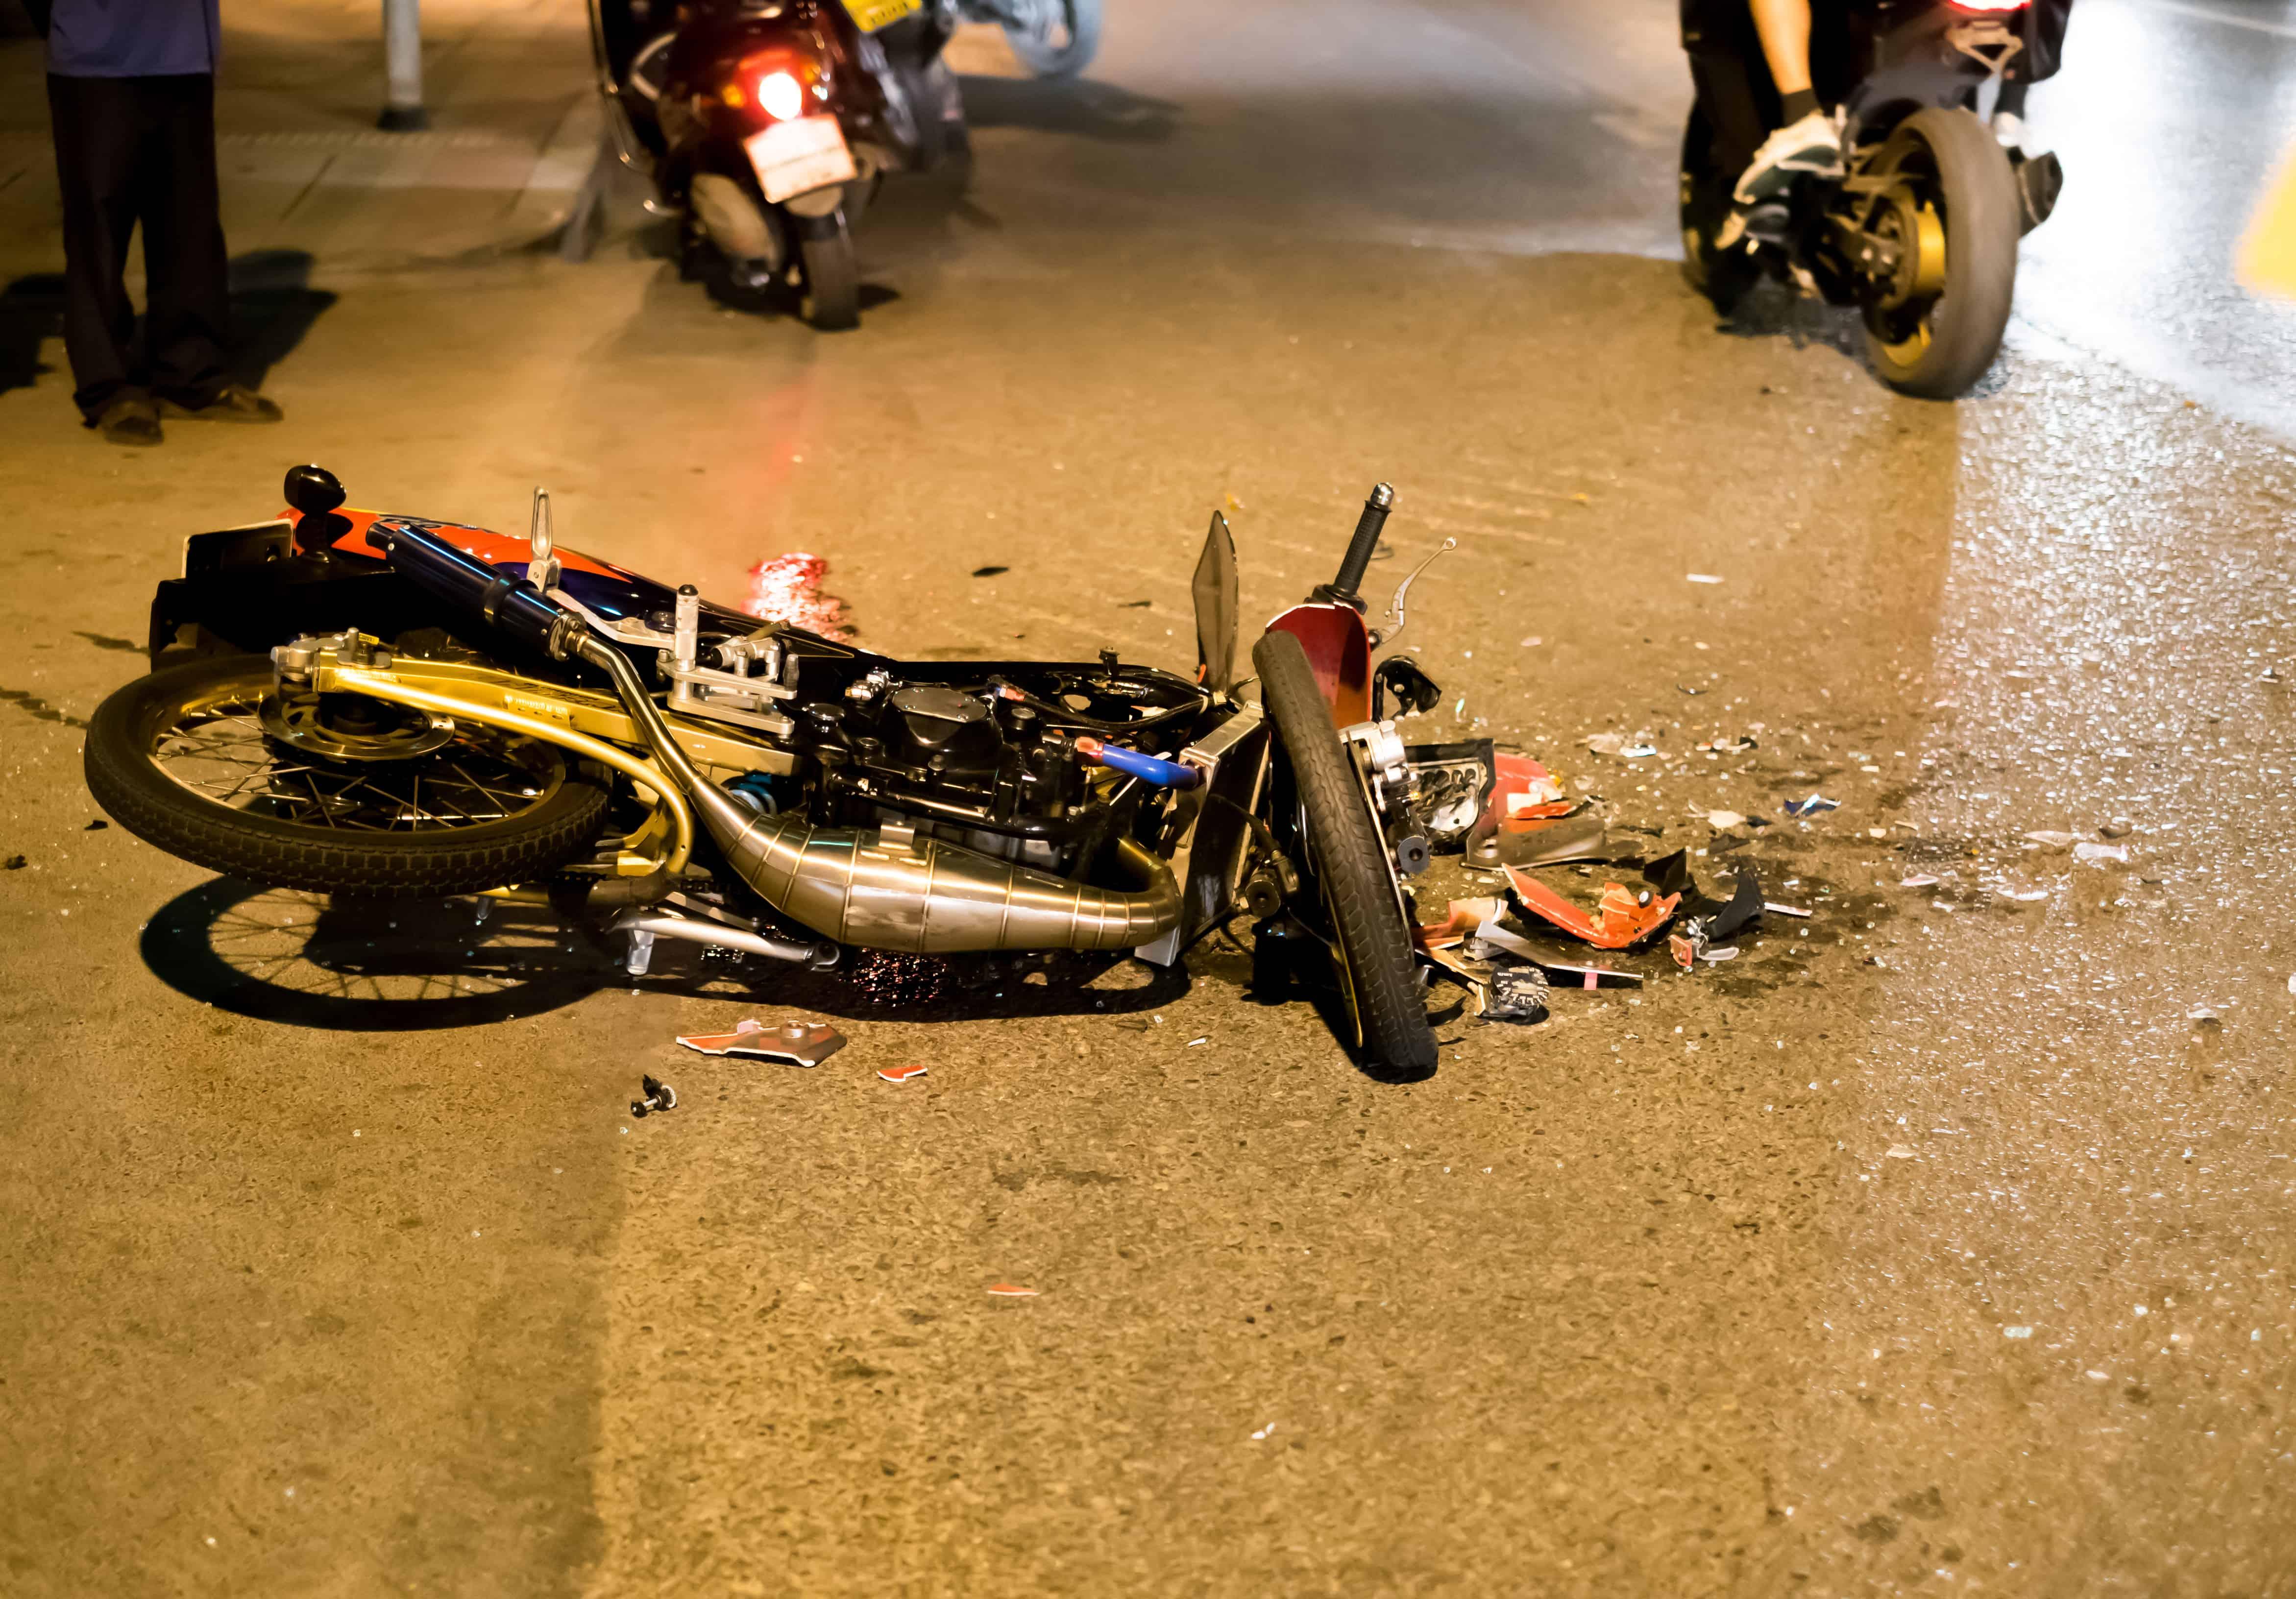 Motorcyclist Injured in Crash on Amargosa Road near La Mesa Road [Victorville, CA]